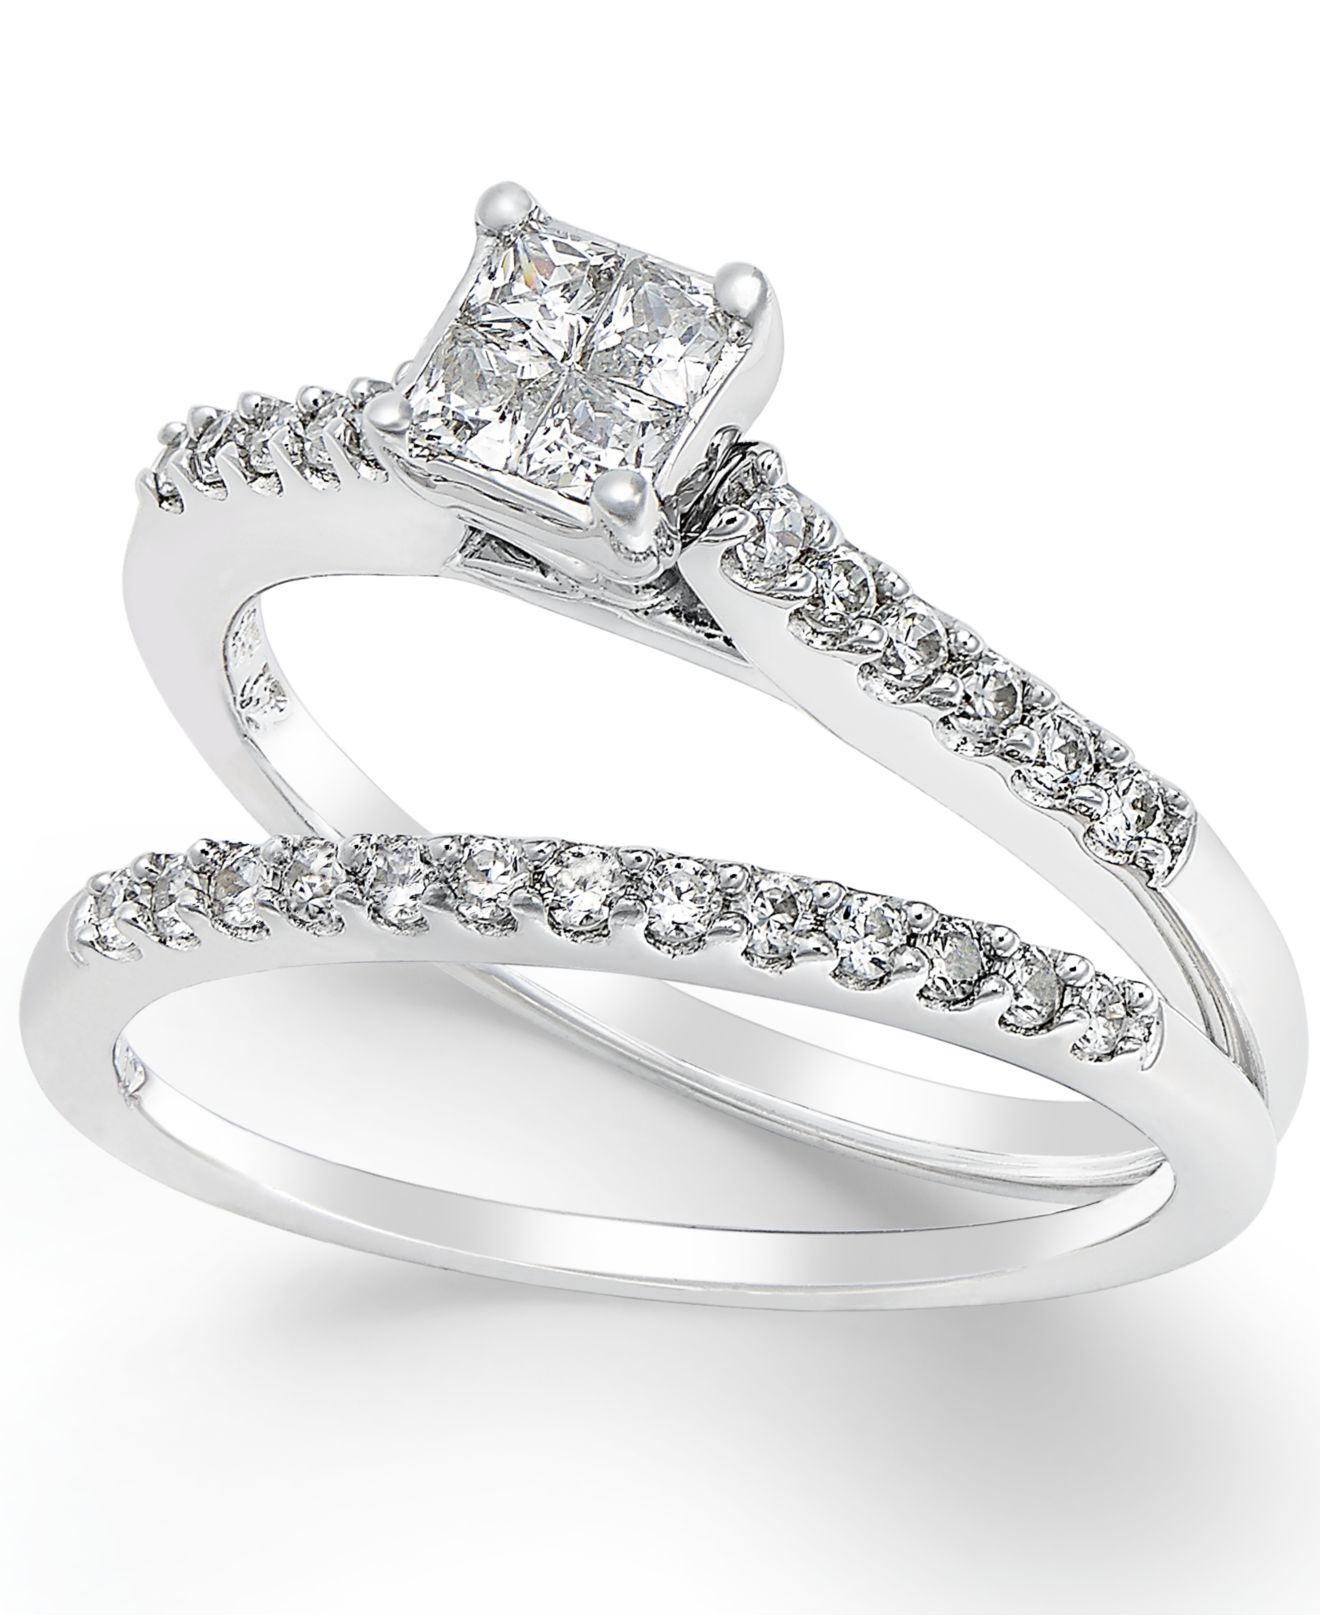 Macy s Diamond Engagement Ring Bridal Set 1 2 Ct T w In 14k White Gol